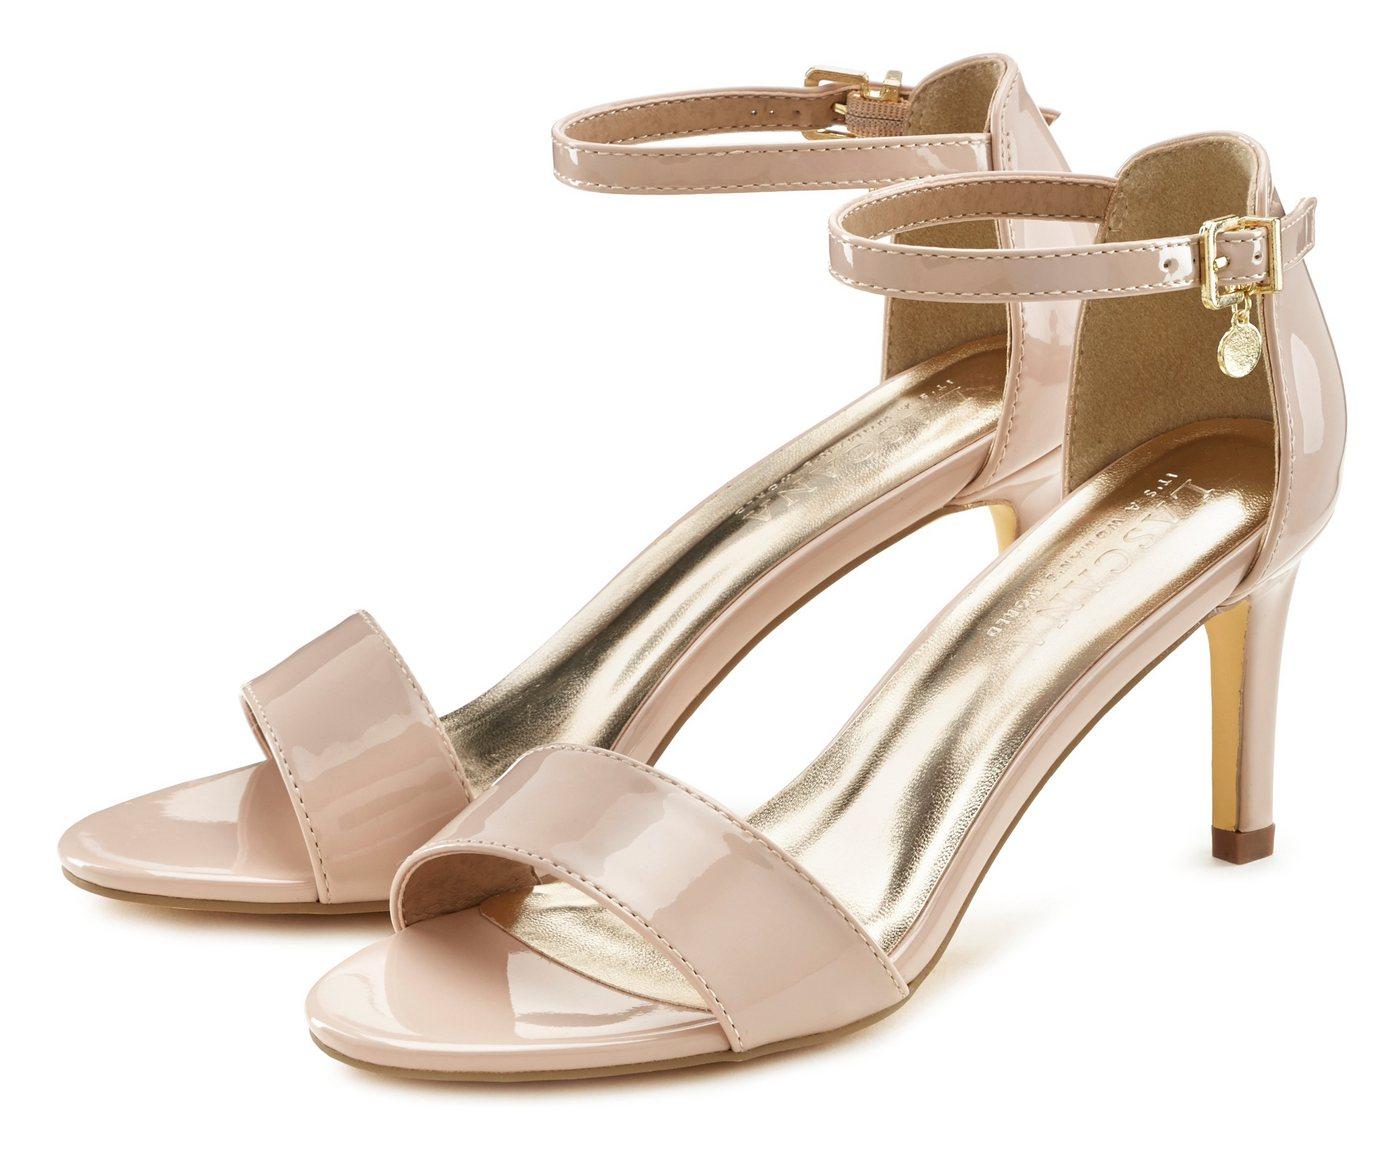 lascana -  Sandalette im zeitlosem Design